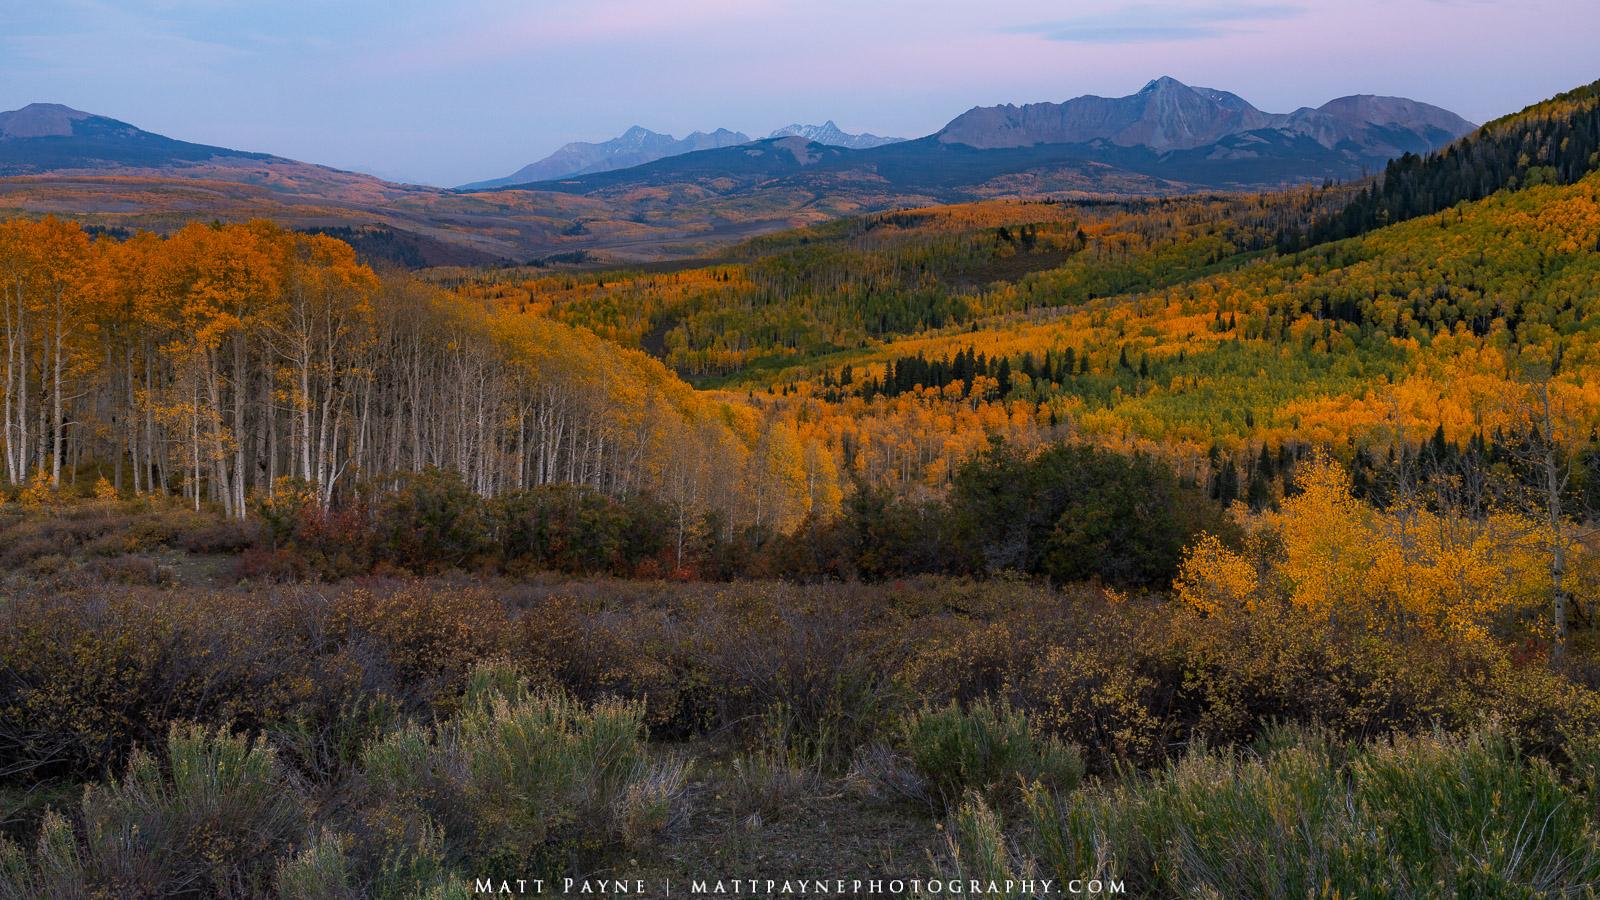 14er, Aspen Trees, Autumn, Colorado, El Diente, Fall, Fall Colors, Foliage, Landscape, Mountains, San Juan Mountains, Wilson Peak, colorful, landscape photography, photo